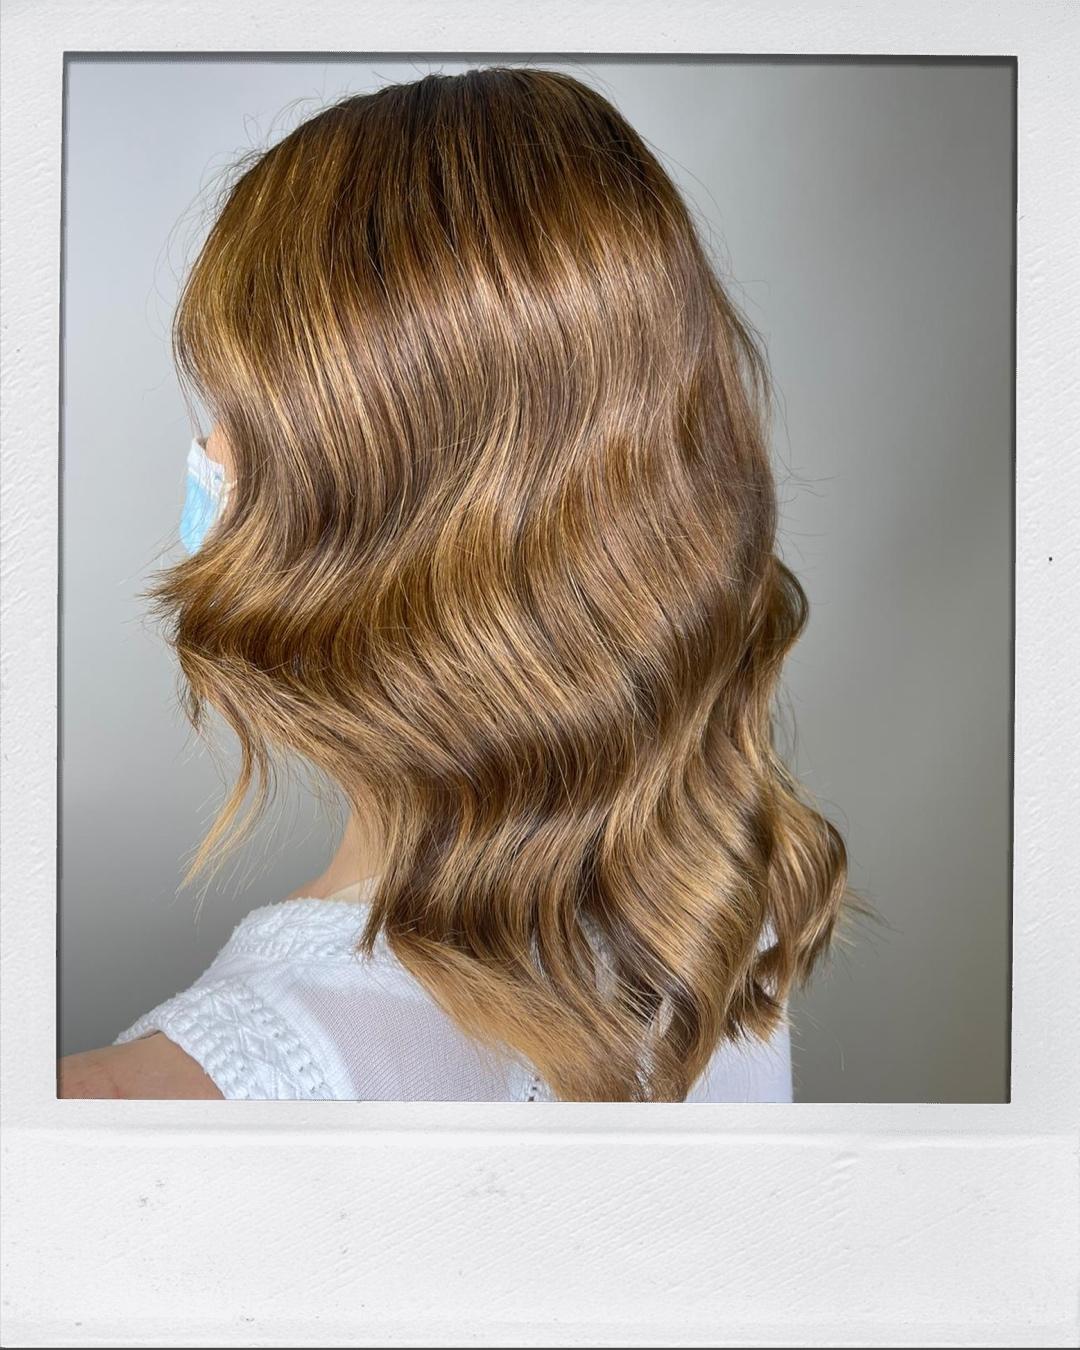 balayage_week_toni&guy_preguntas_respuestas_hairstyle_blonde_hair_3